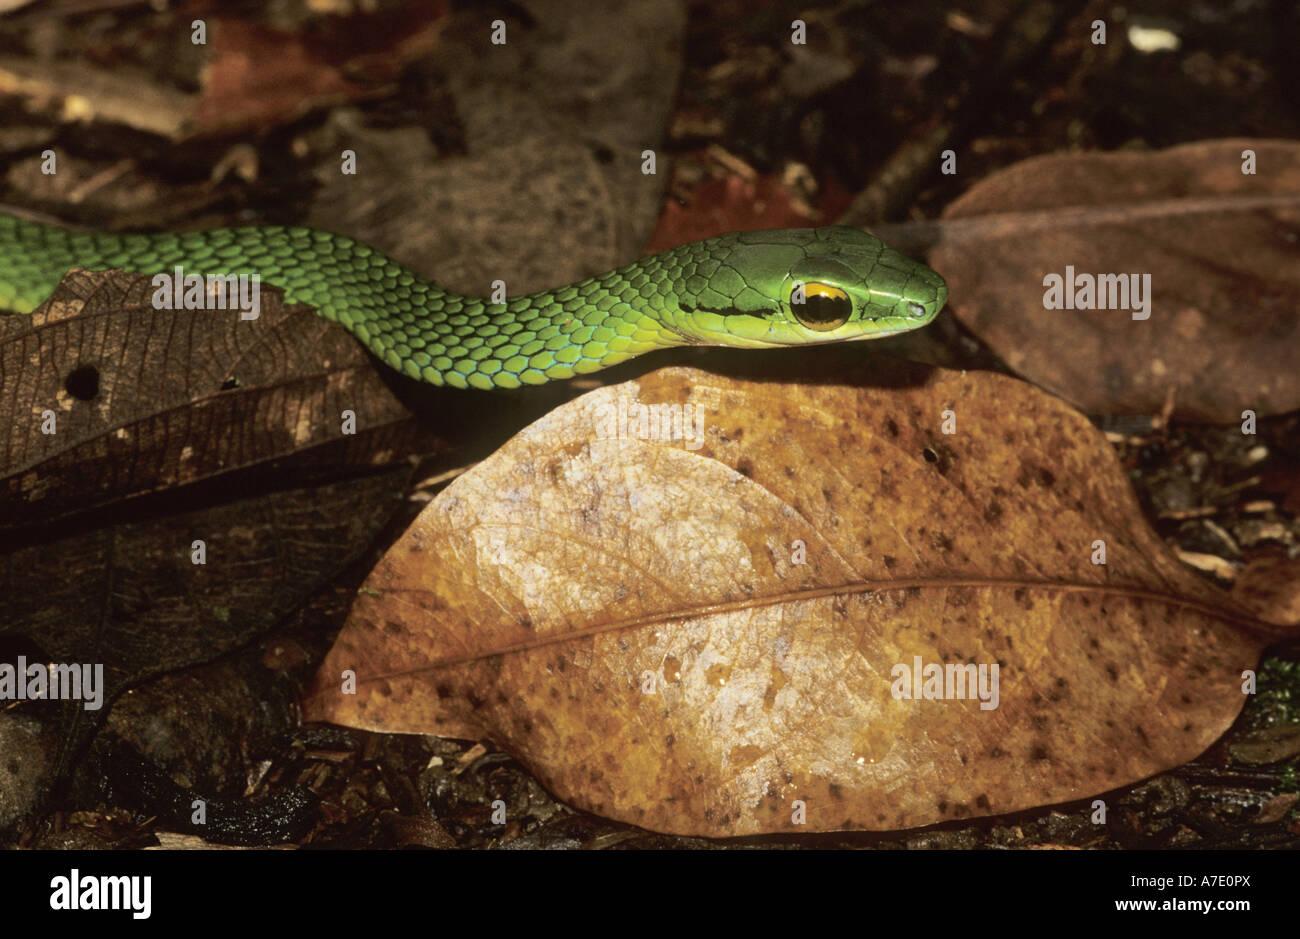 Cope Vine Snake, Copes Vine Snake (Oxybelis brevirostris), ritratto Foto Stock